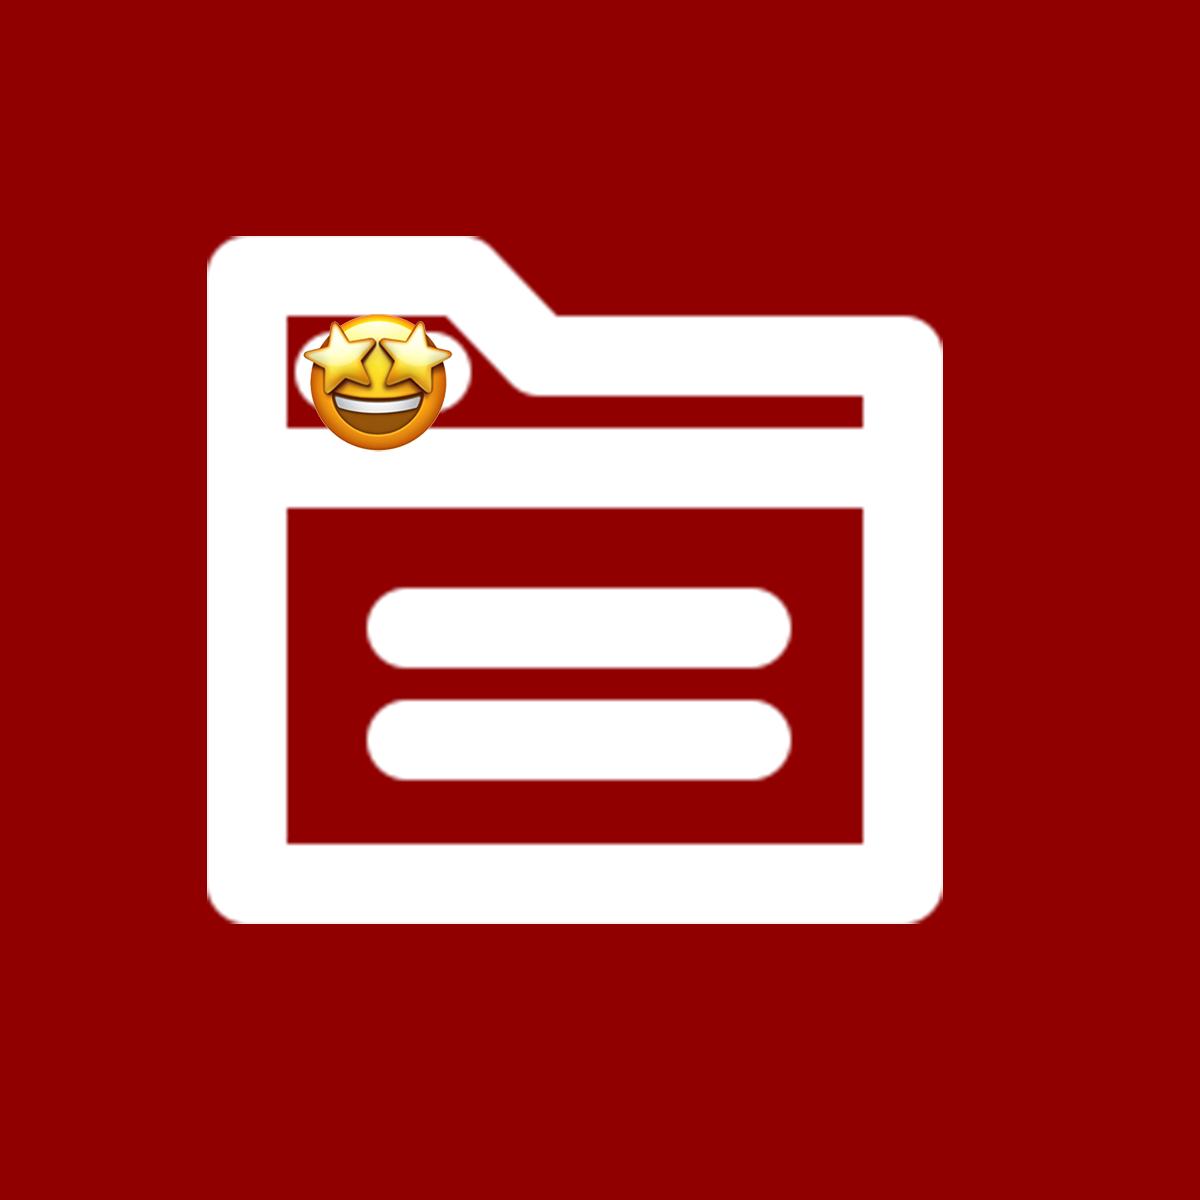 Shopify Browser tab app by Cloud1galaxy